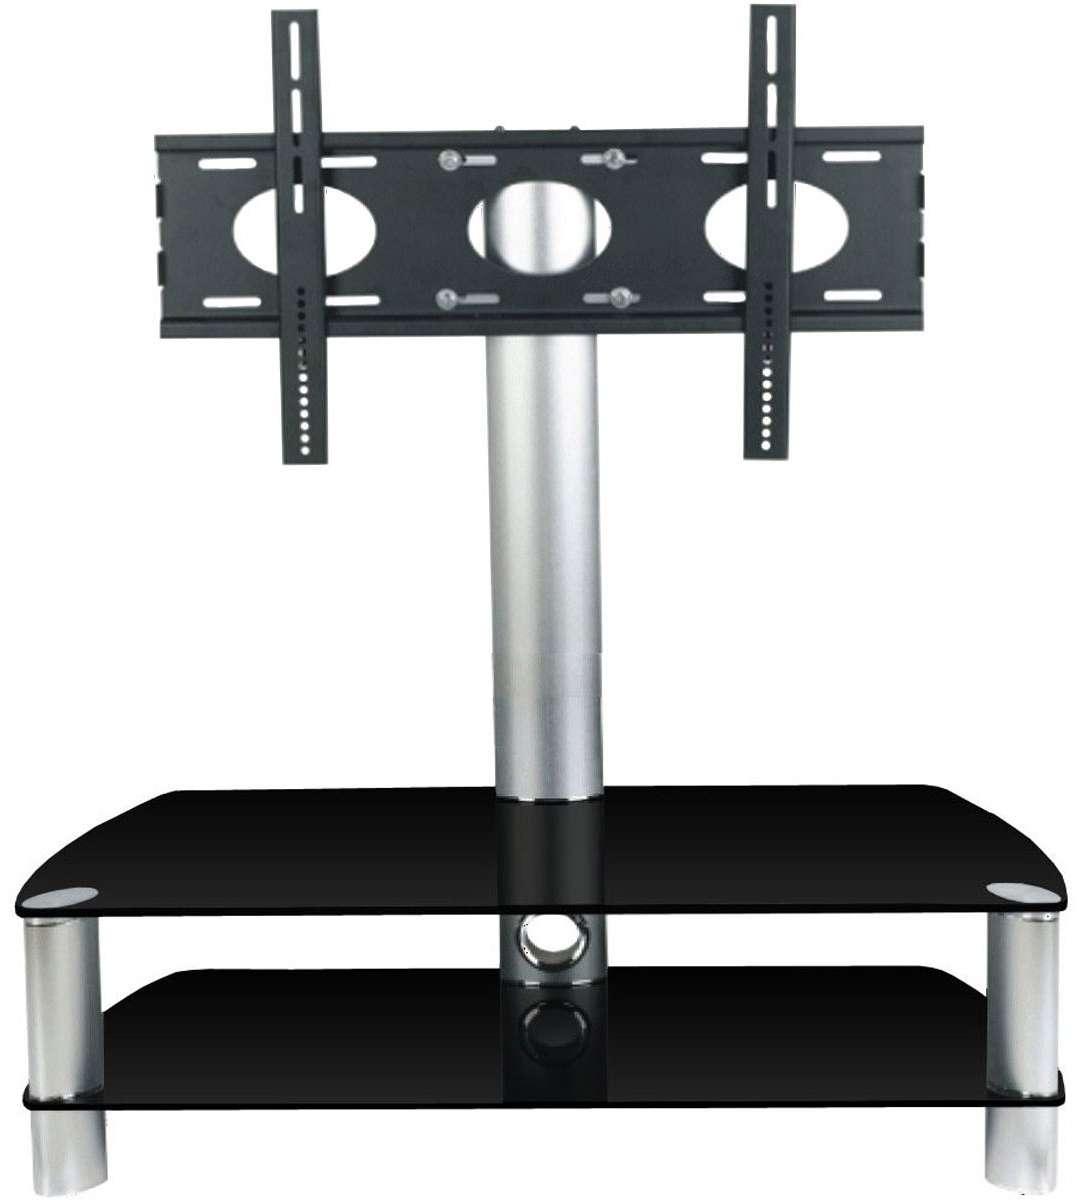 Stil Stand Stuk 2053chbl Tv Stands In Stil Tv Stands (View 2 of 15)